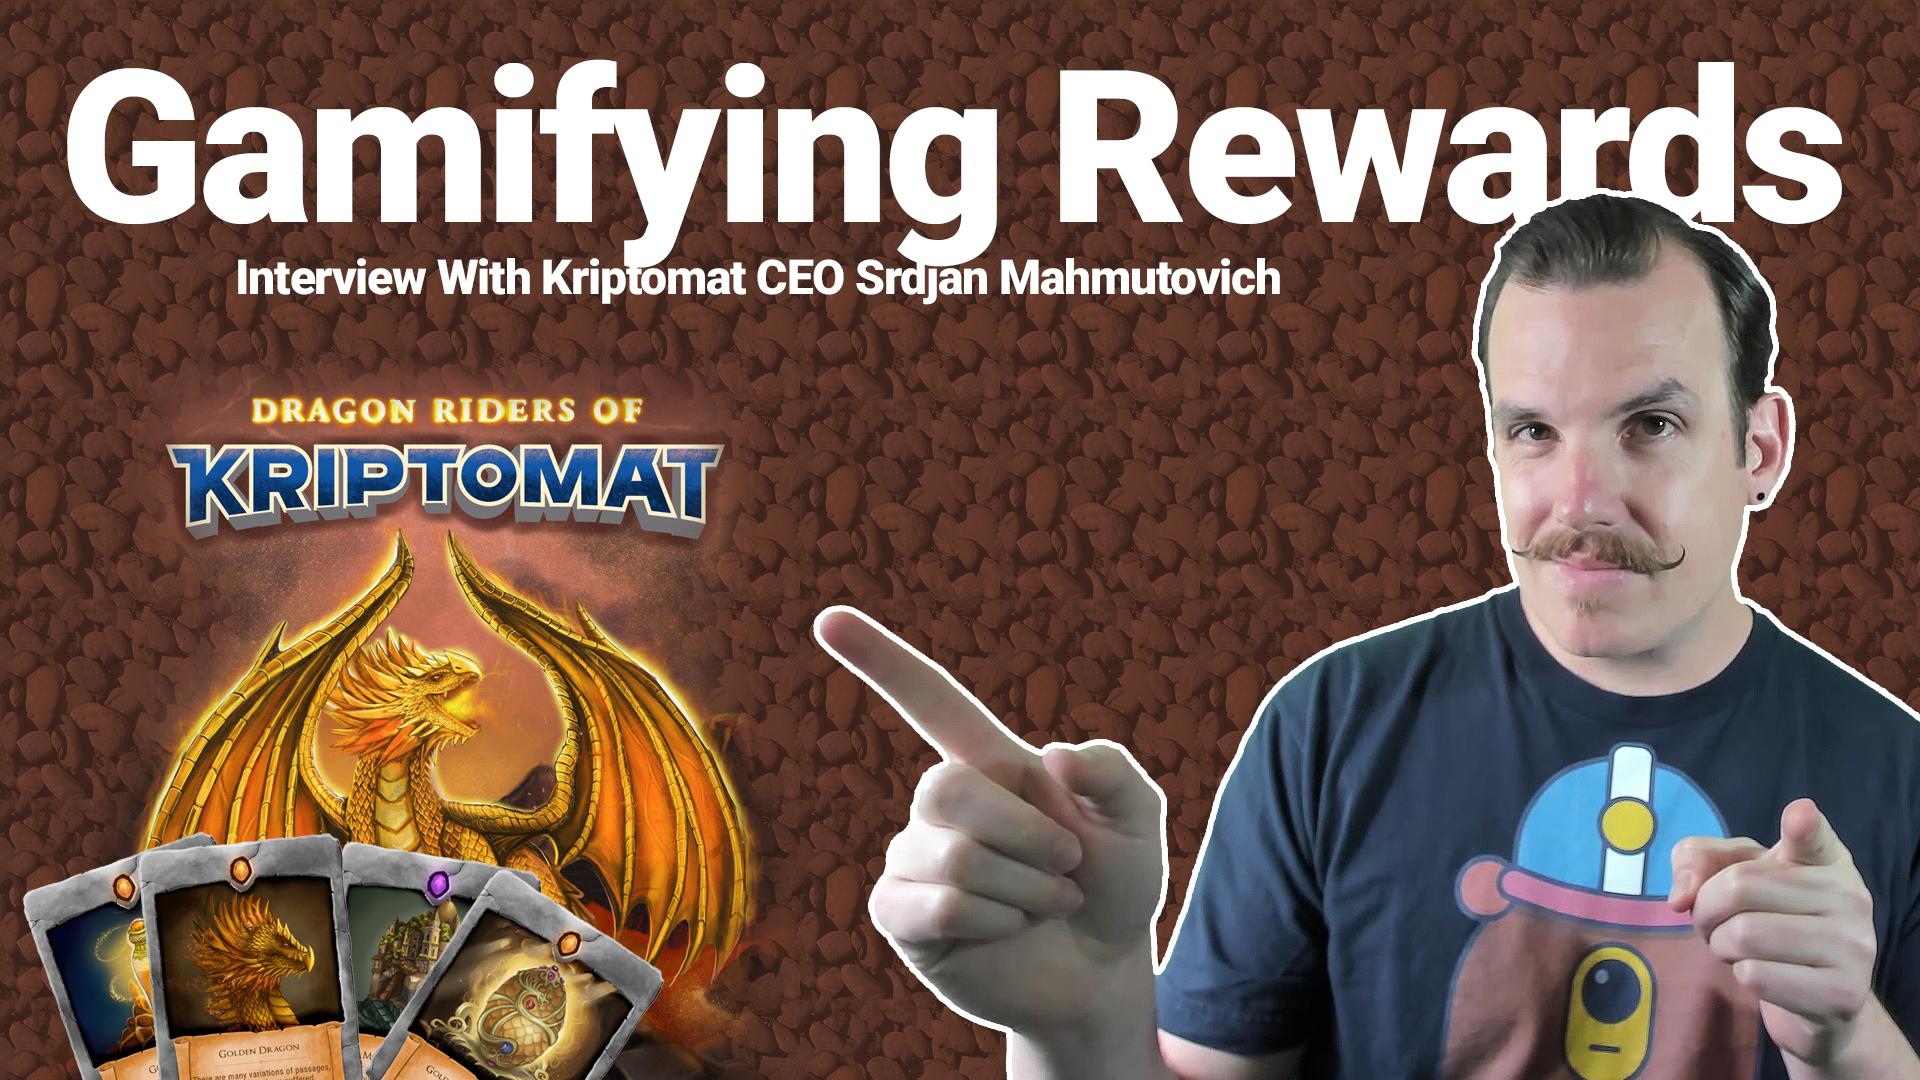 Interview with Srdjan Mahmutovich, Kriptomat CEO - Revolutionizing Retail Rewards enjin enjincoin blockchain gaming